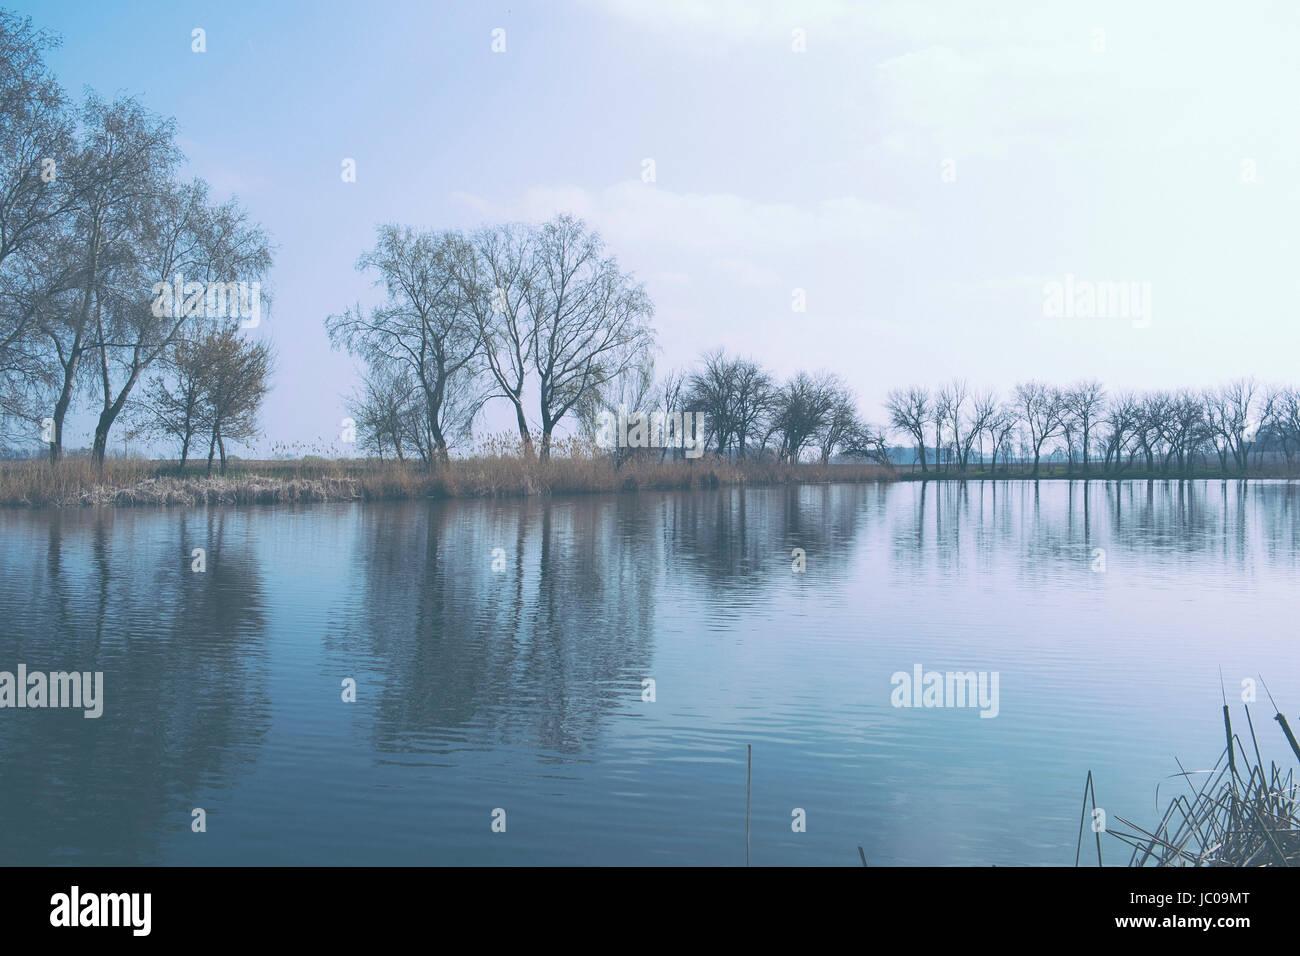 Looks like film photo of nature scene - Stock Image